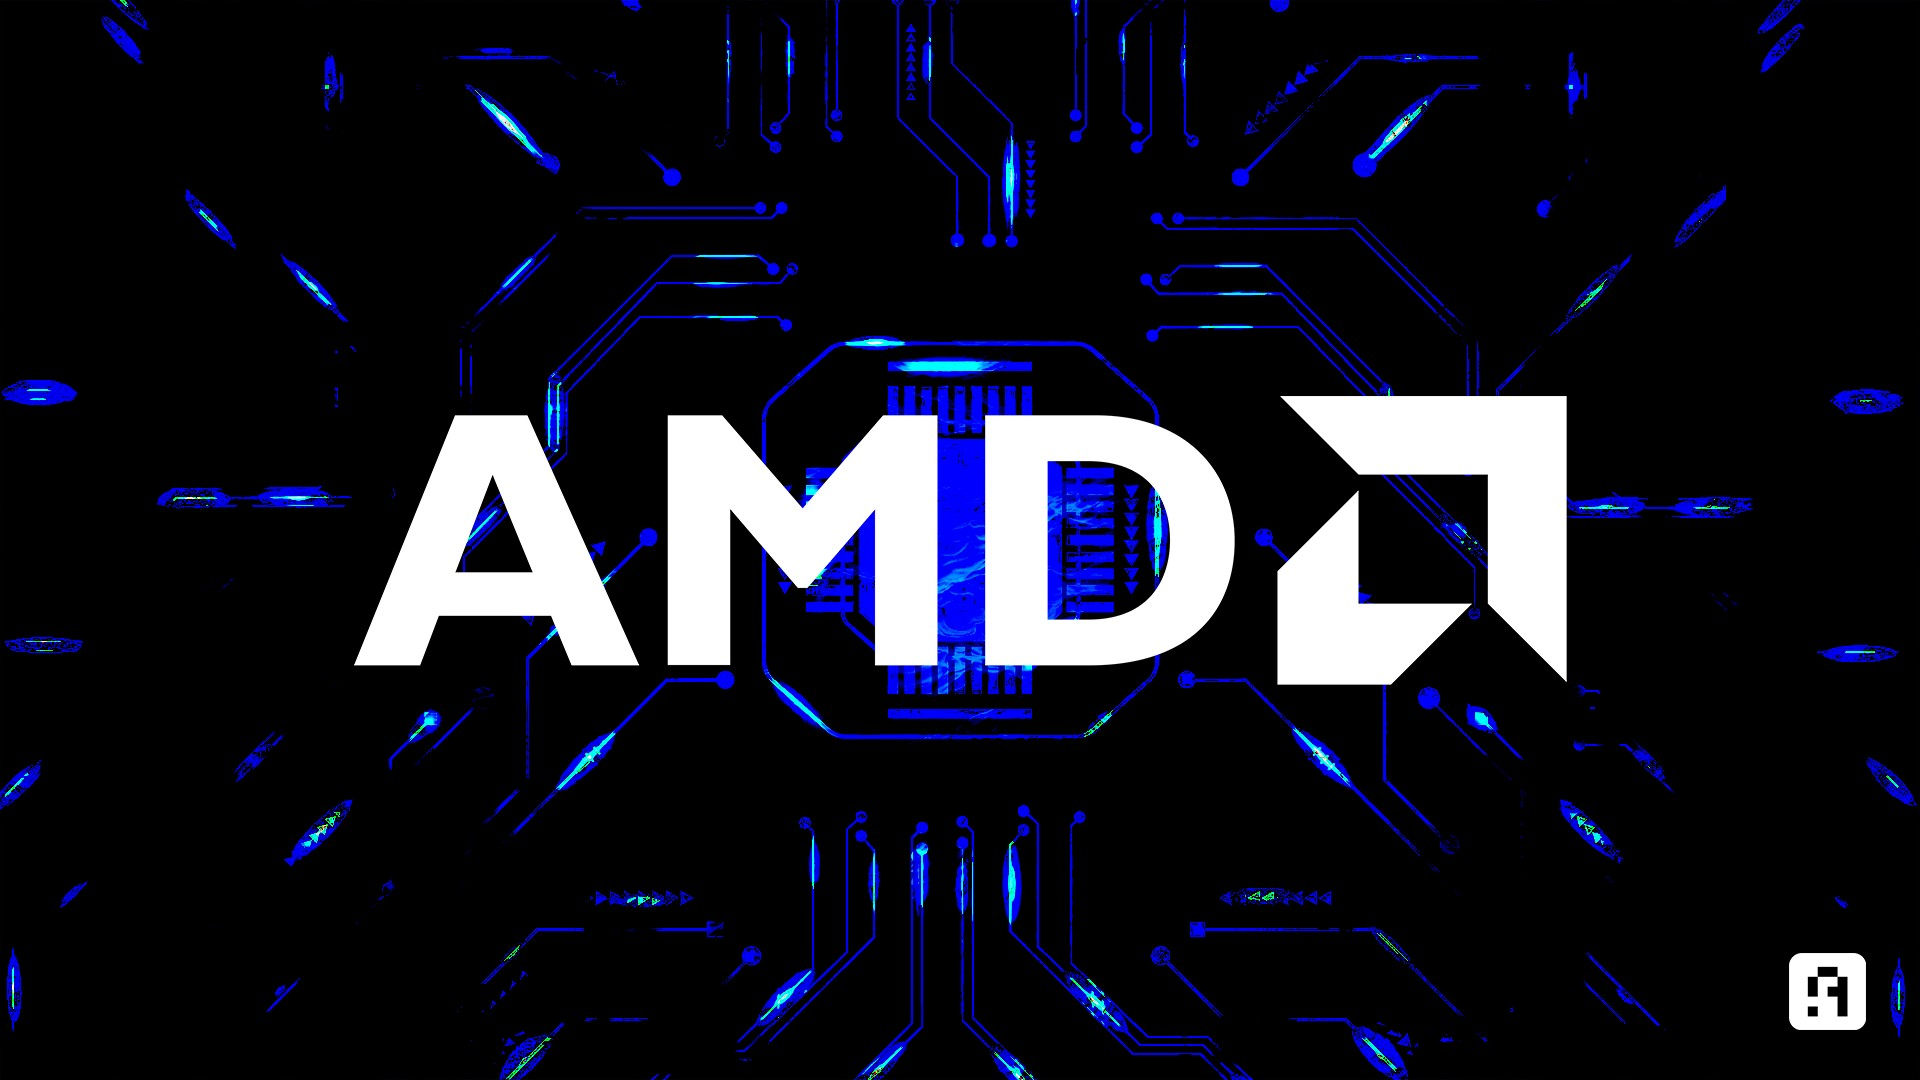 AMD - Arabhardware Generic Photos